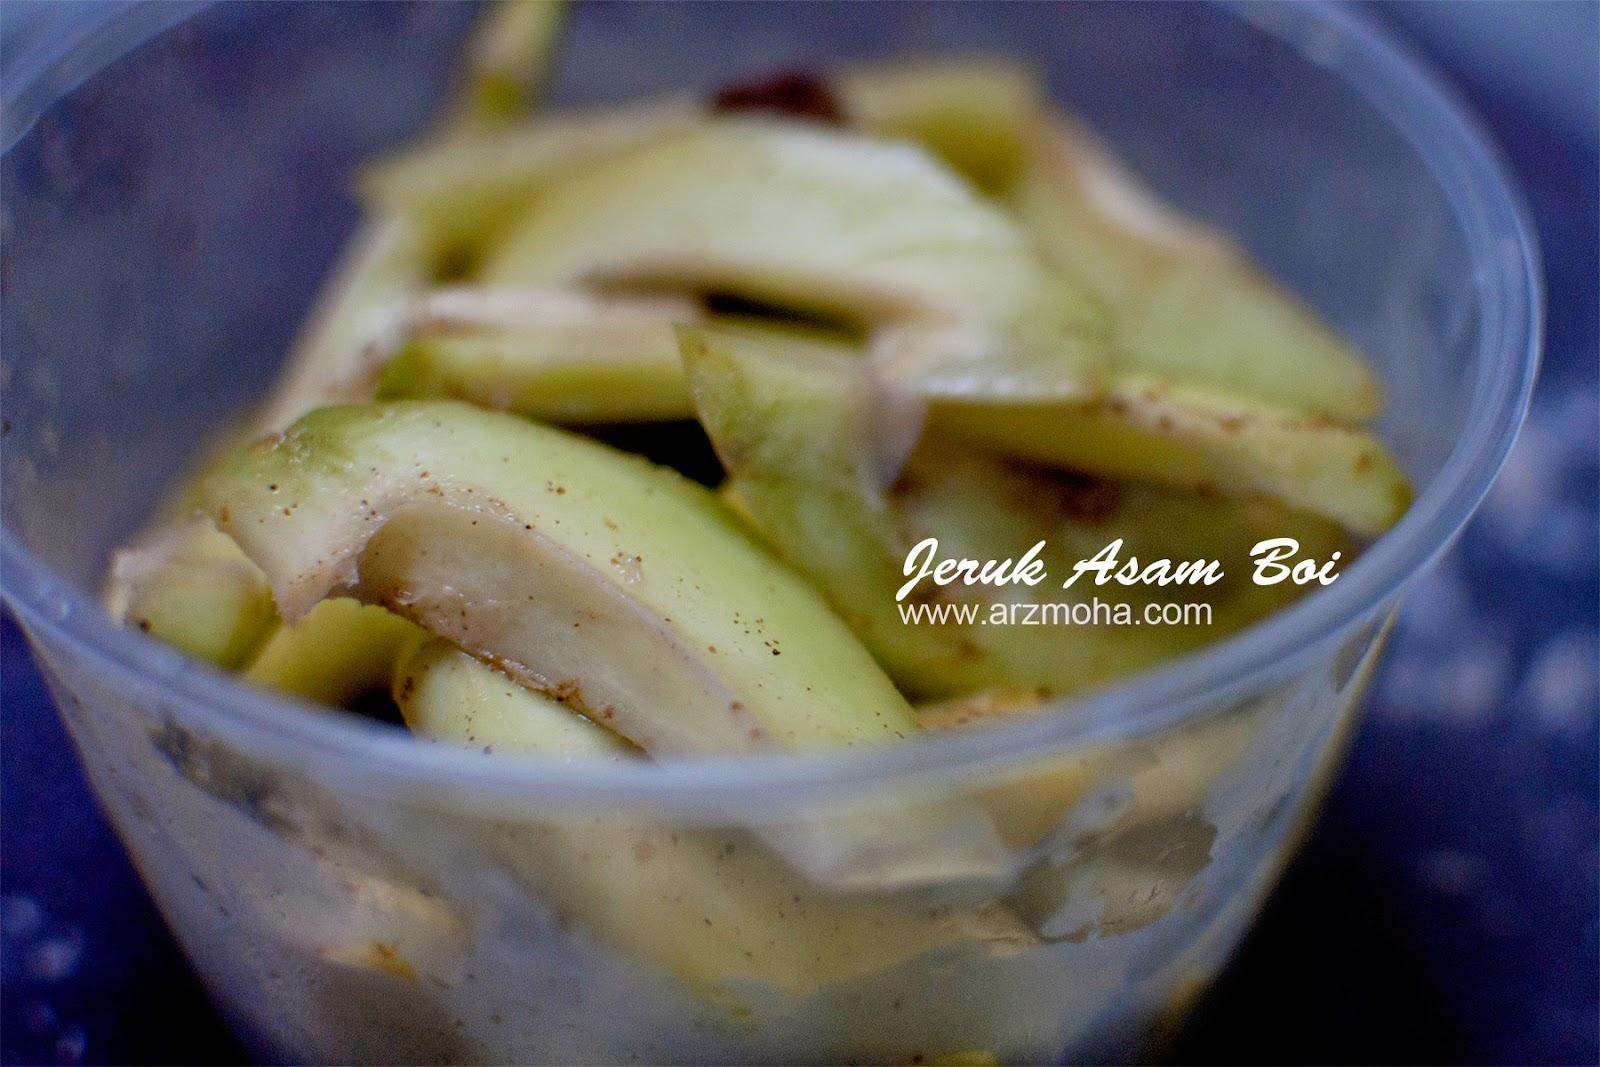 Jeruk Asam Boi Sedap, Jeruk Asam Boi Pulau Pinang, Jeruk, Asamboi, Fenomena, food review